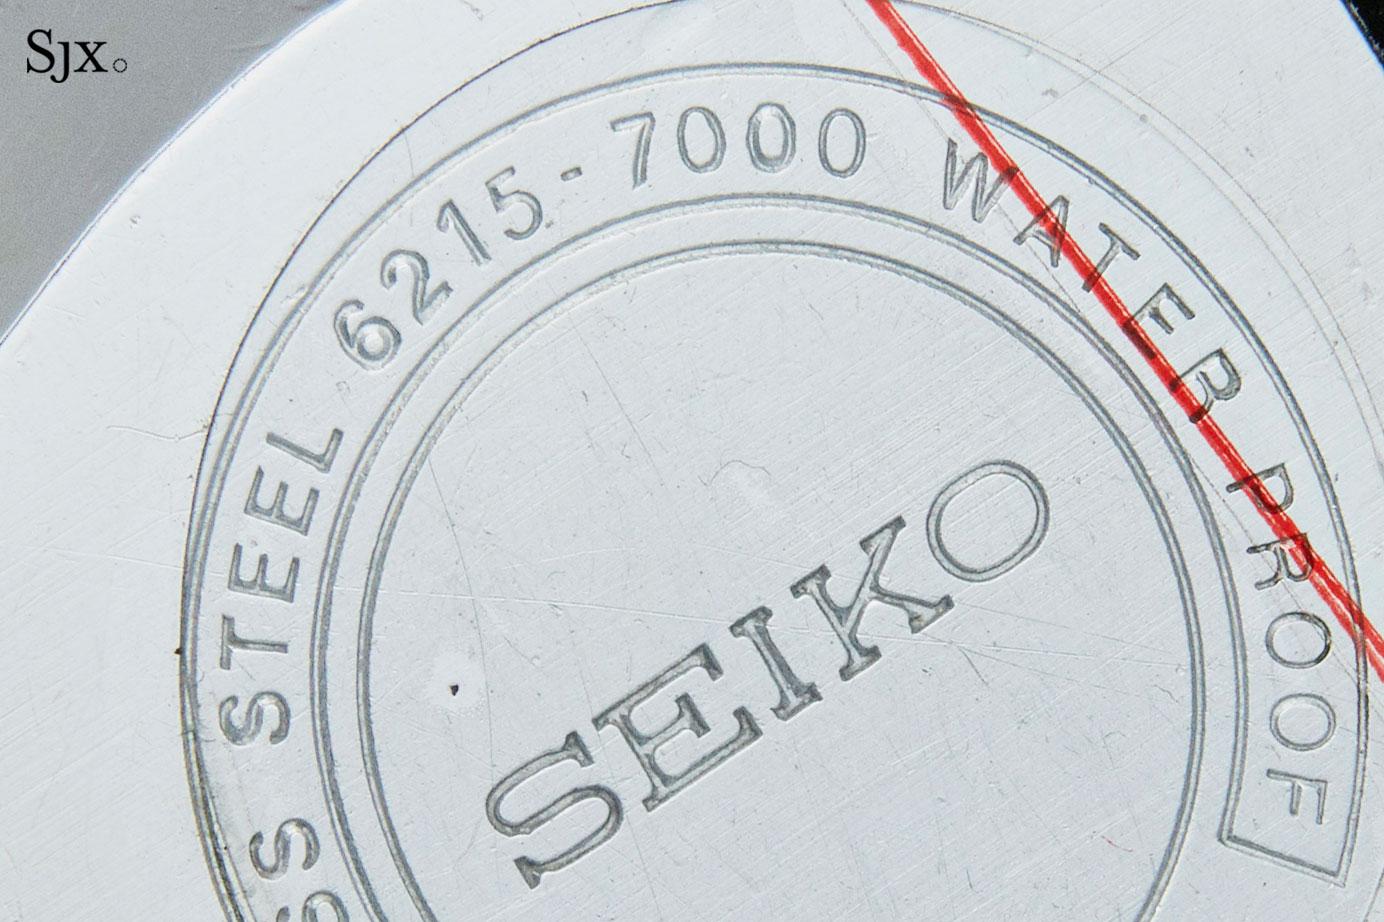 Seiko 300m diver 6215-7000 3